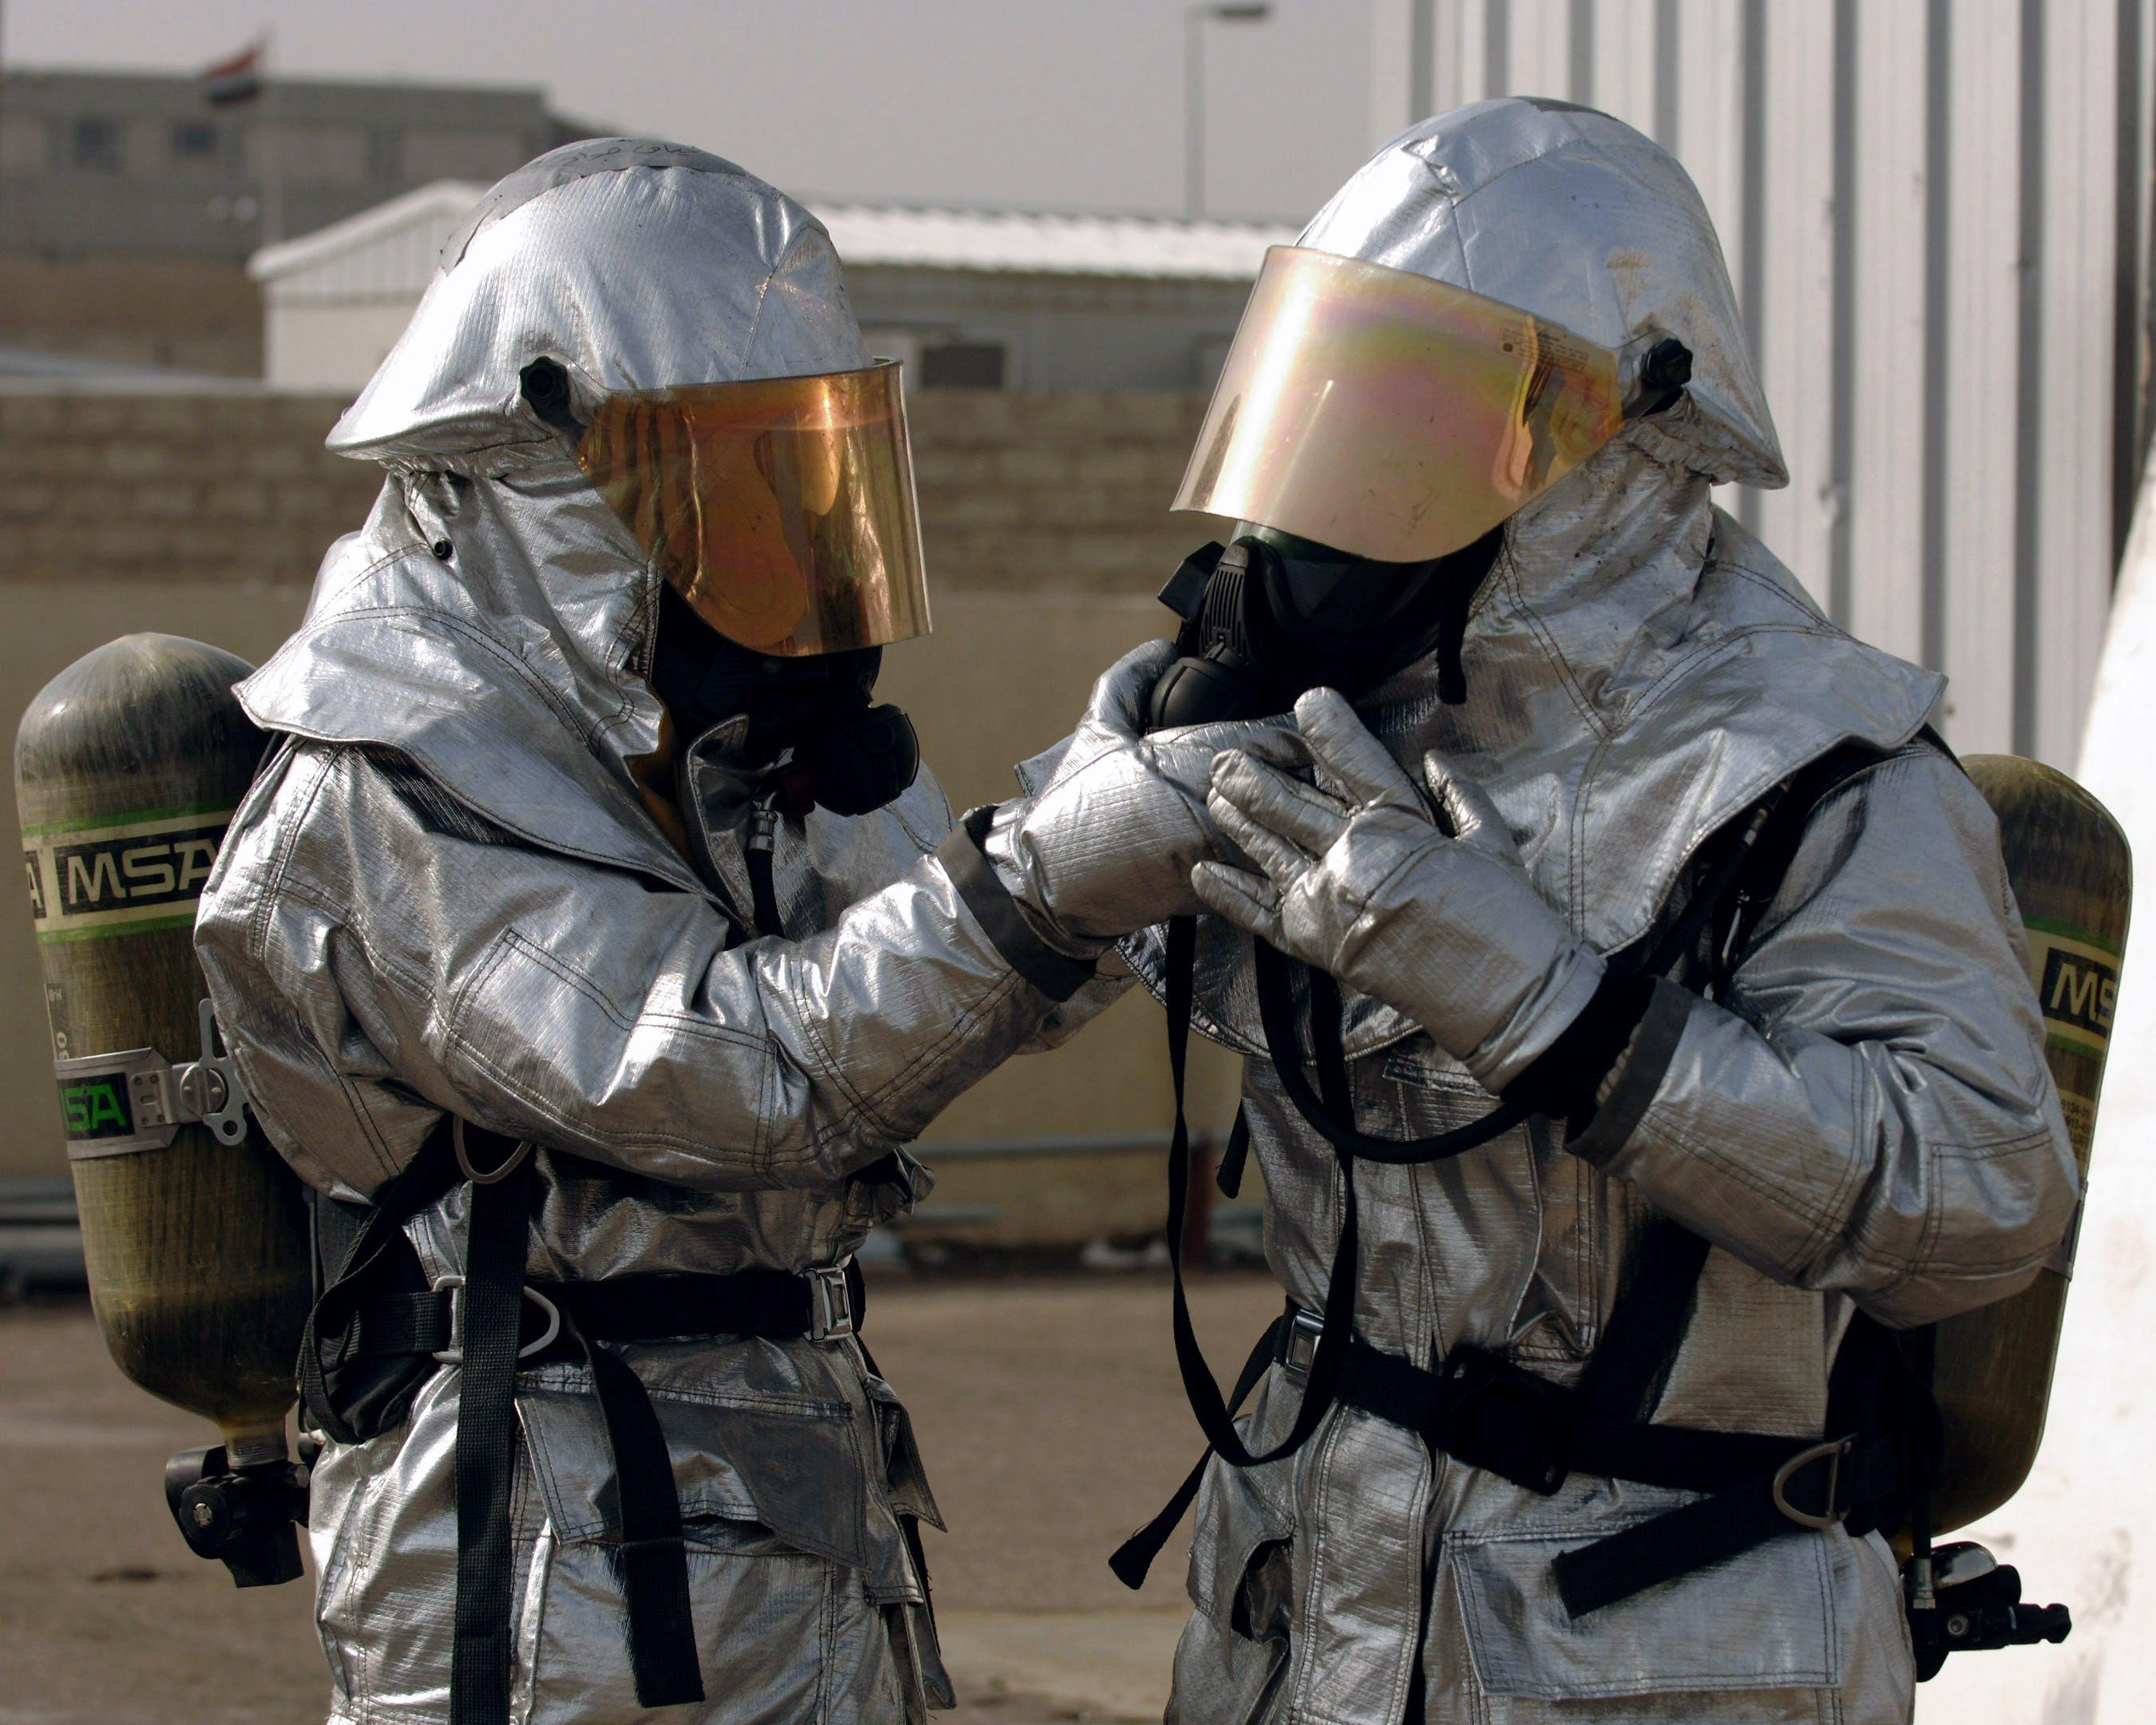 breathing apparatus, dangerous, equipment